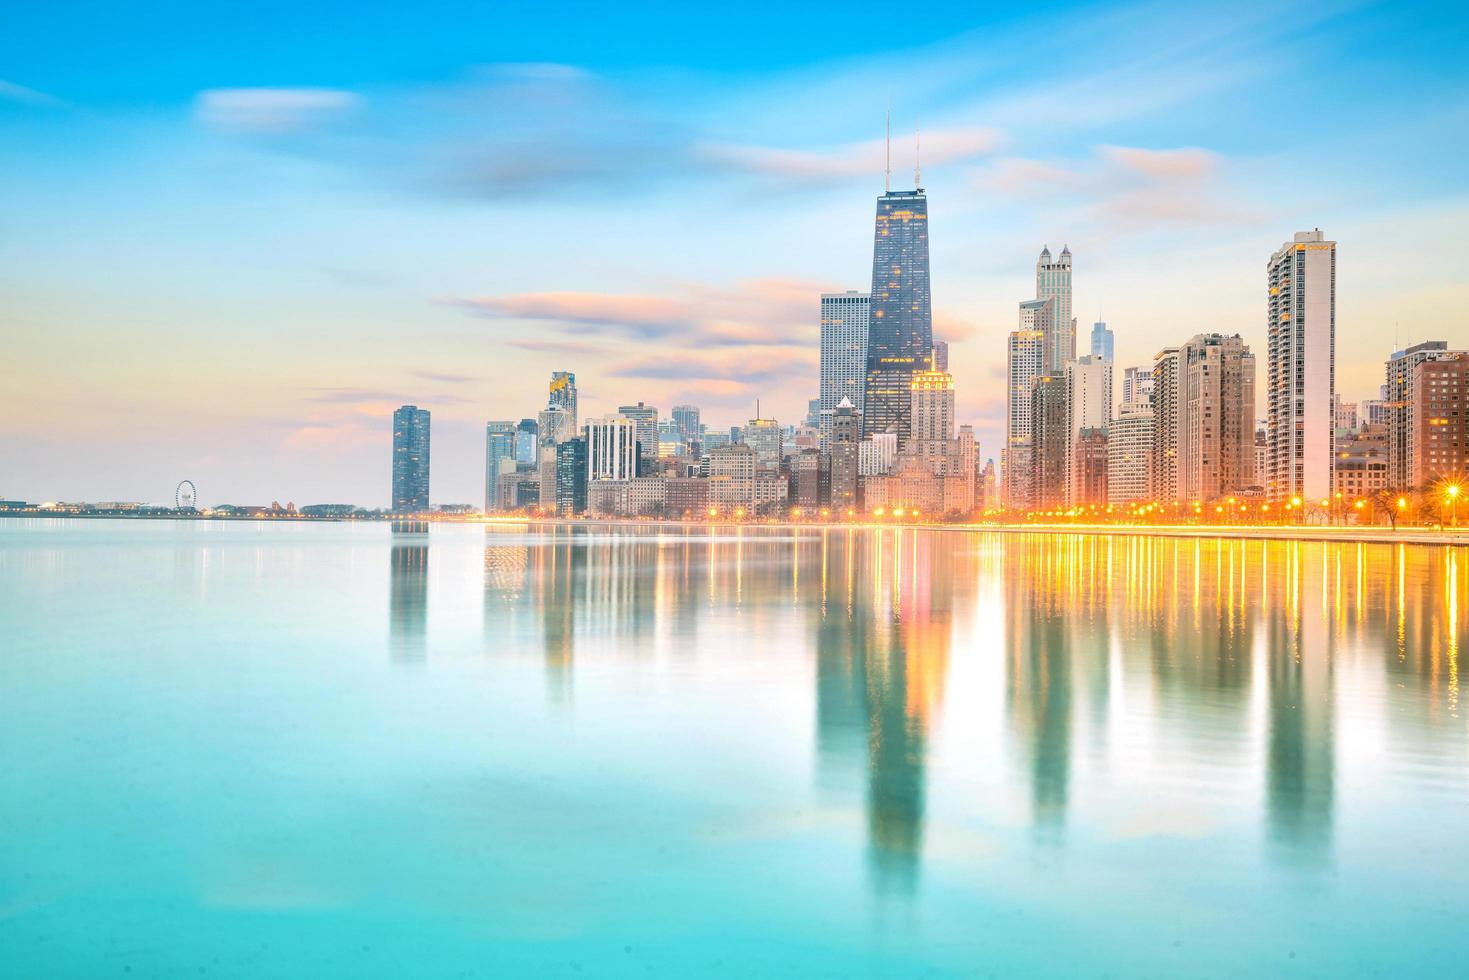 Horizonte del centro de Chicago al atardecer, Illinois foto